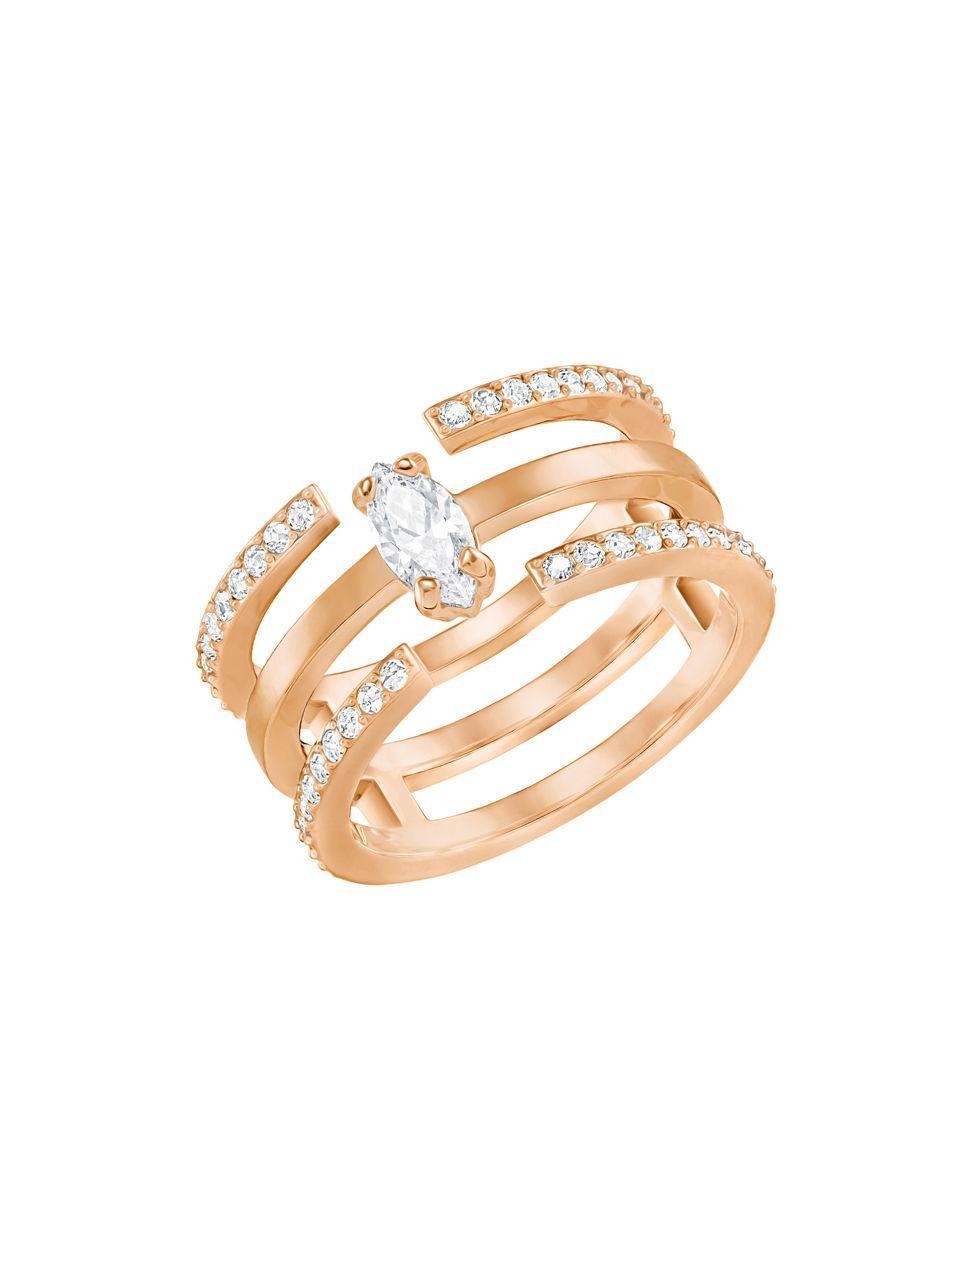 Swarovski Gray Crystal Amp 18k Rose Gold Plated Cutout Ring